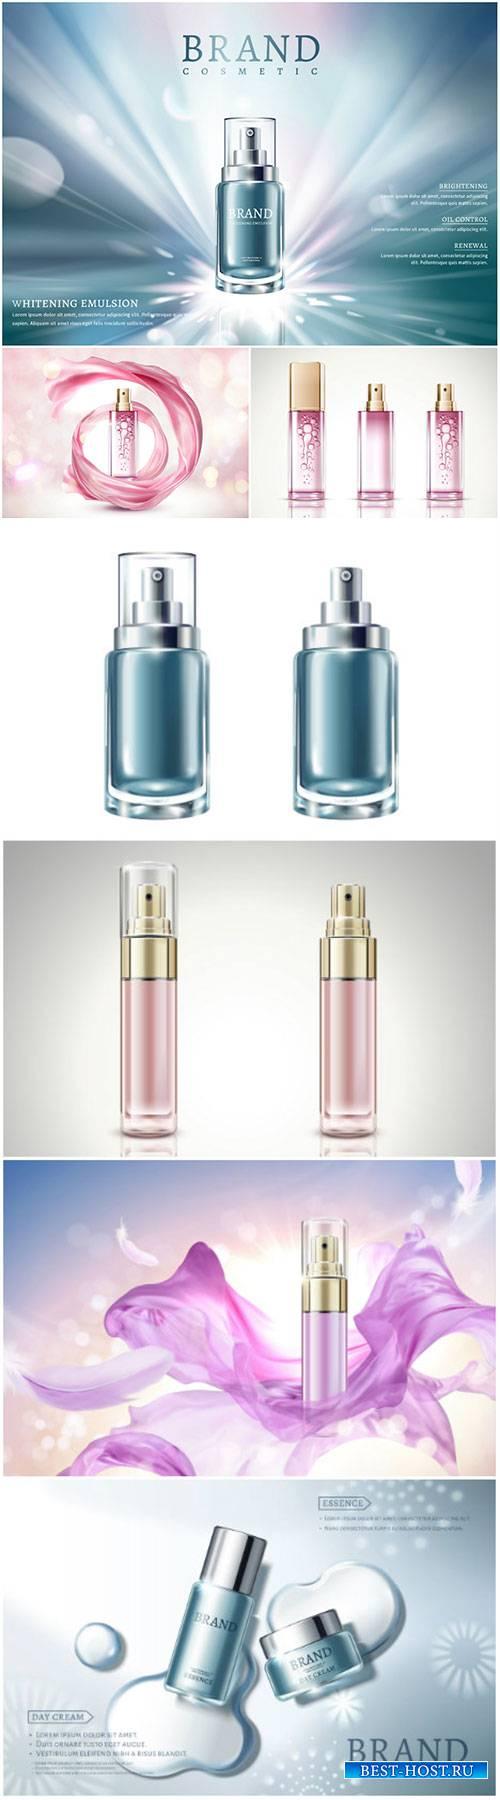 Spray bottle mockup in 3d vector illustration